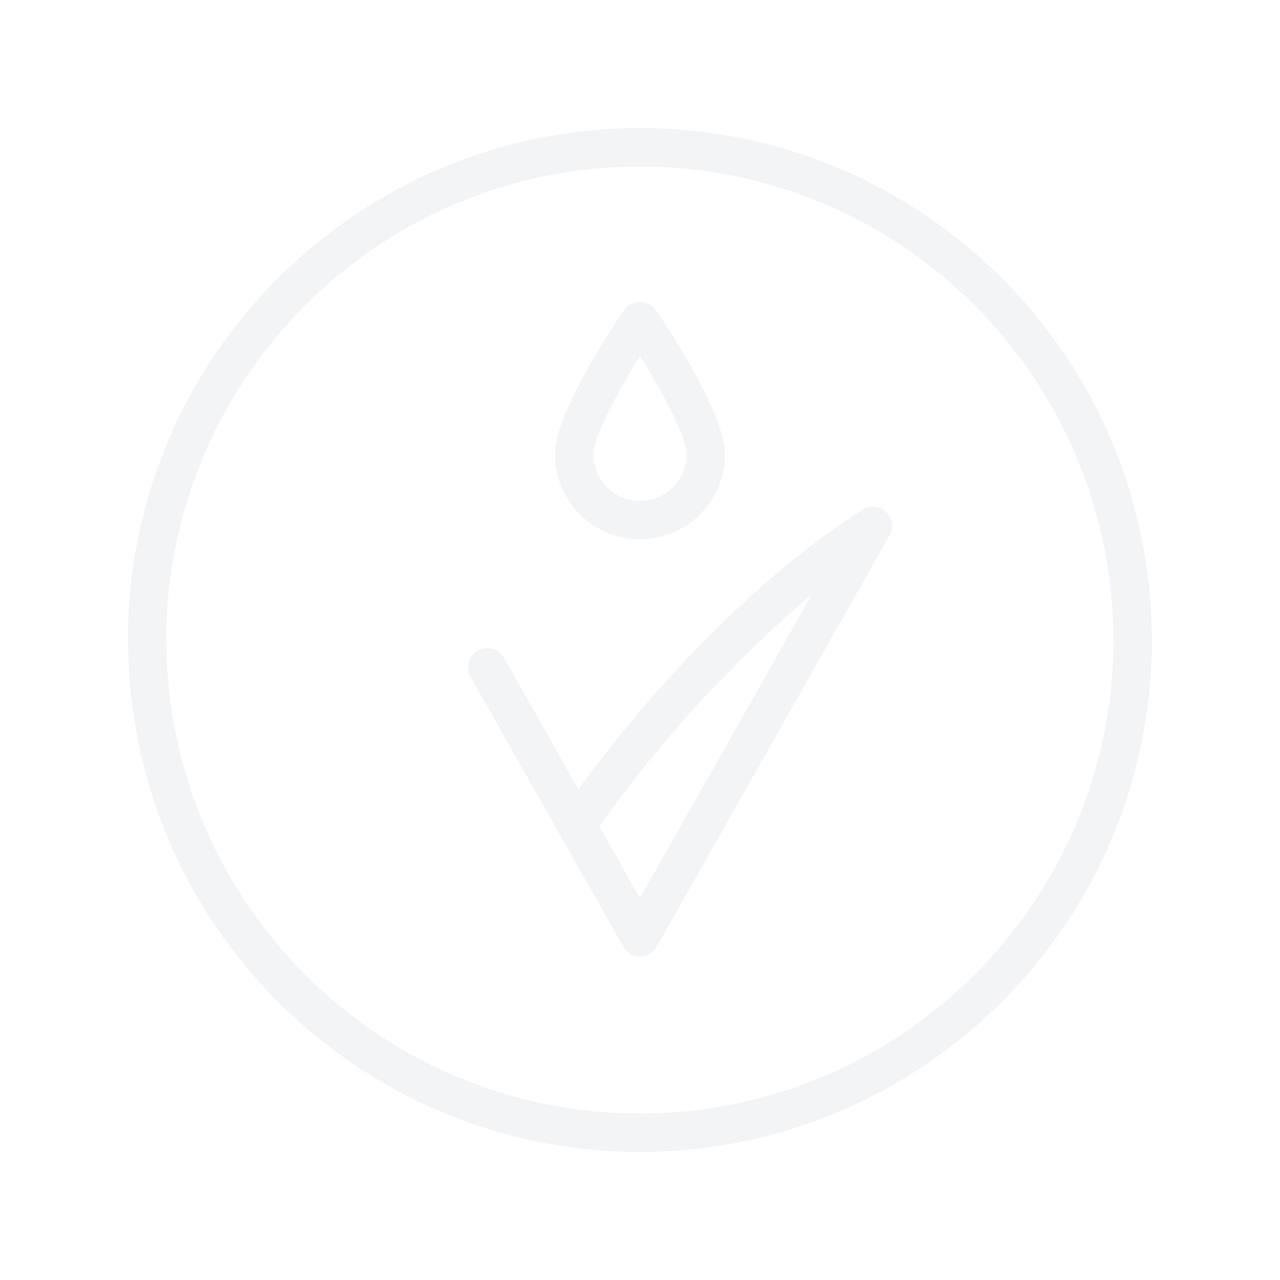 Cempaka Bali Spa Collection 200ml Green Tea Body Scrub Lulur Cream 100gr Wajah